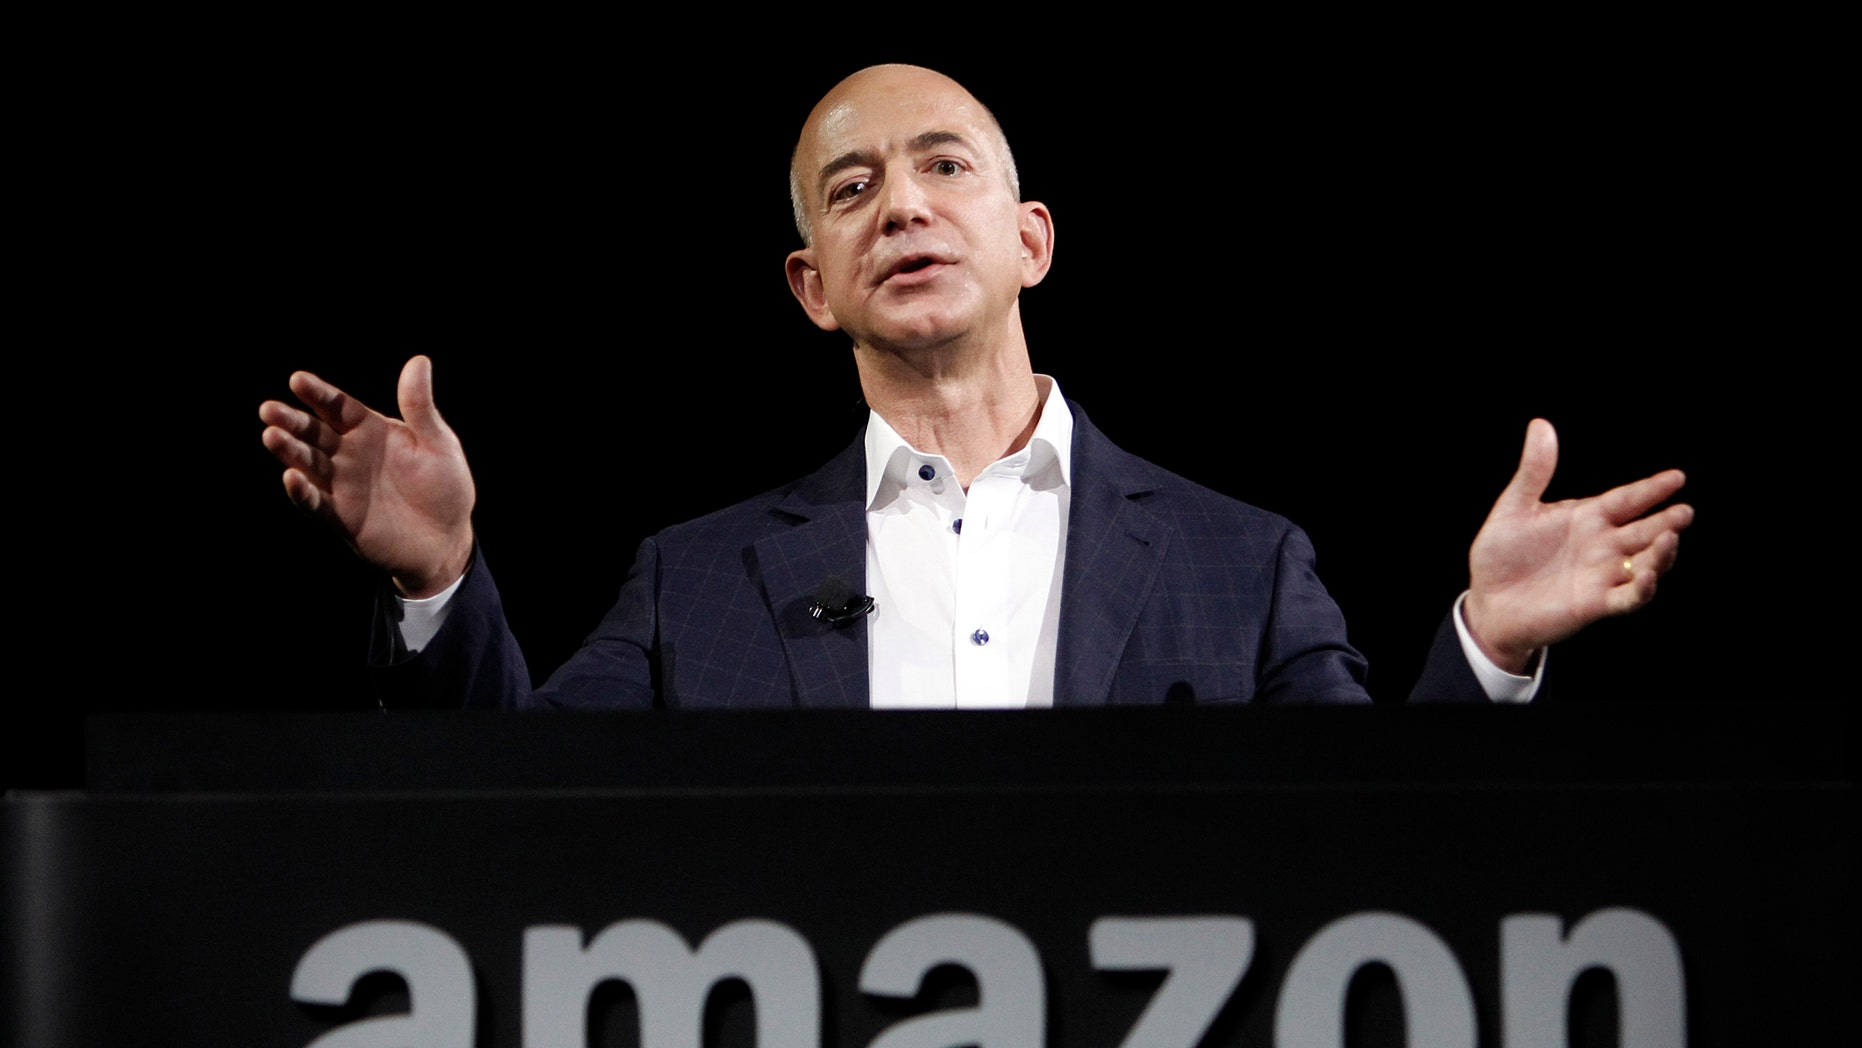 Amazon founder and CEO Jeff Bezos speaks in Santa Monica, Calif., on Sept. 6, 2012.